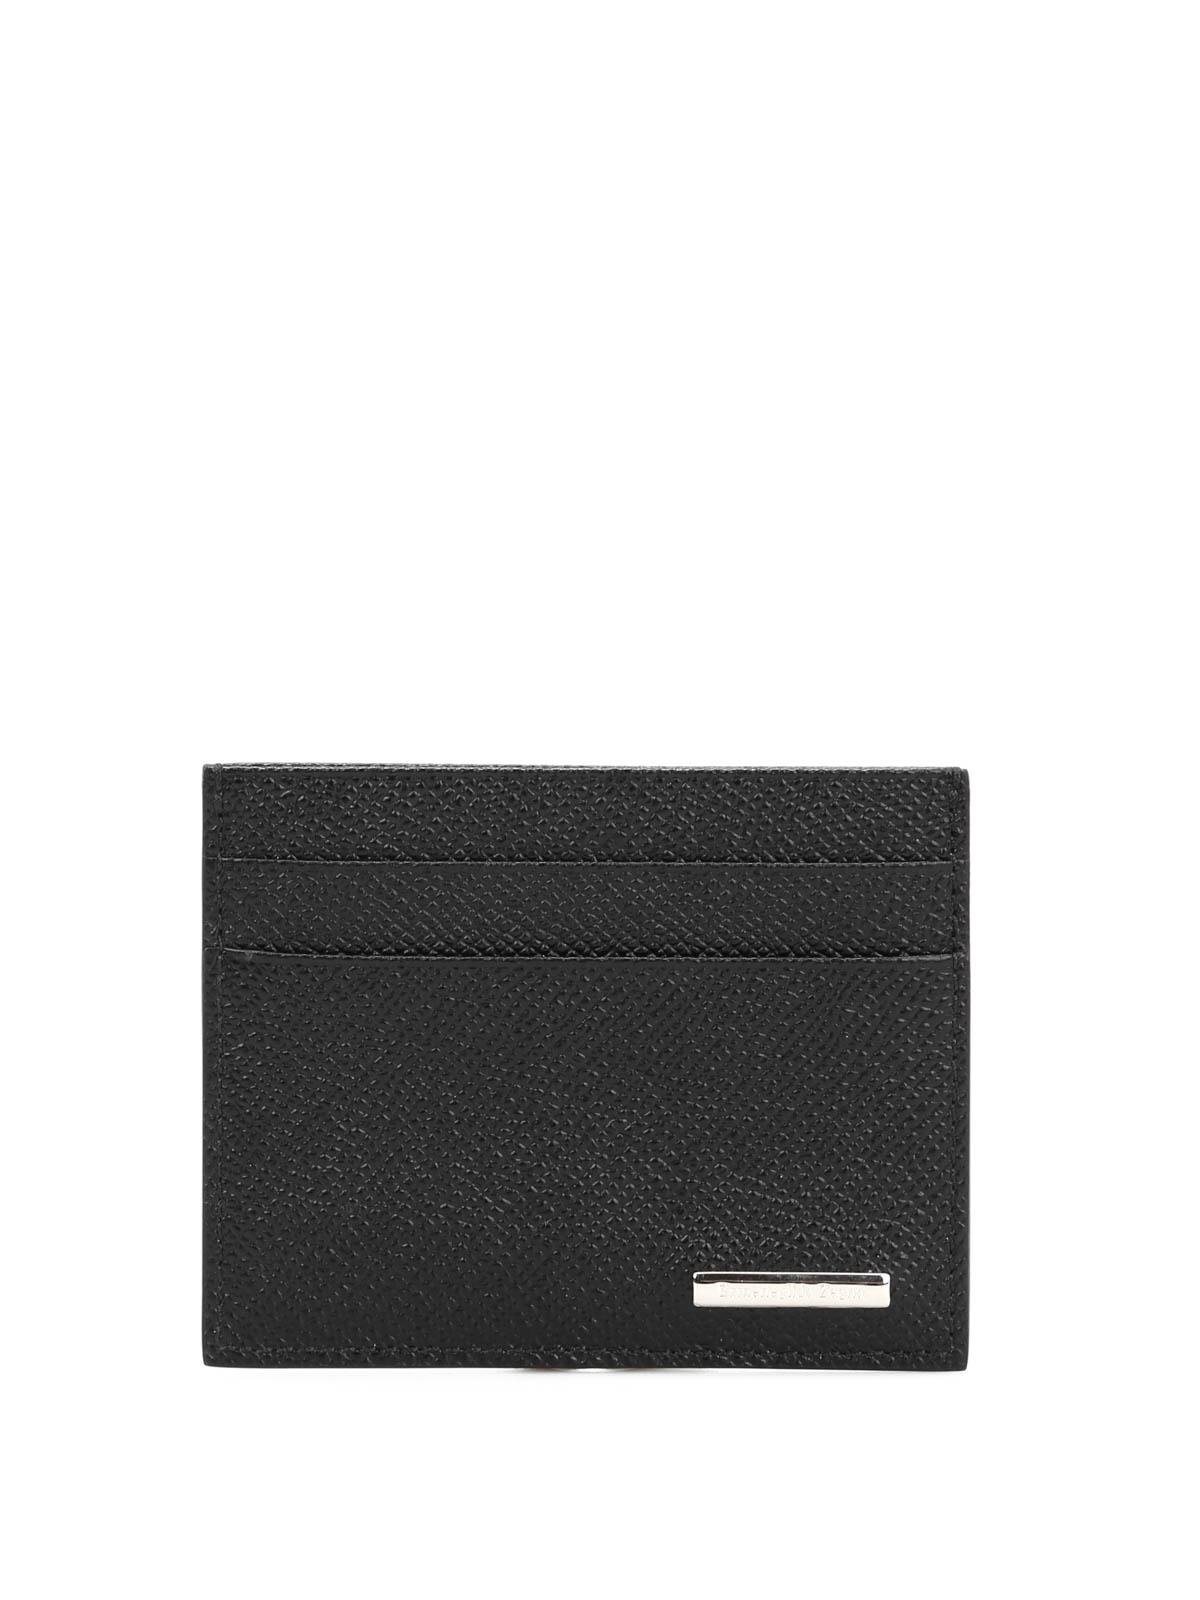 Grained leather card case by ermenegildo zegna wallets purses ermenegildo zegna wallets purses grained leather card case reheart Images